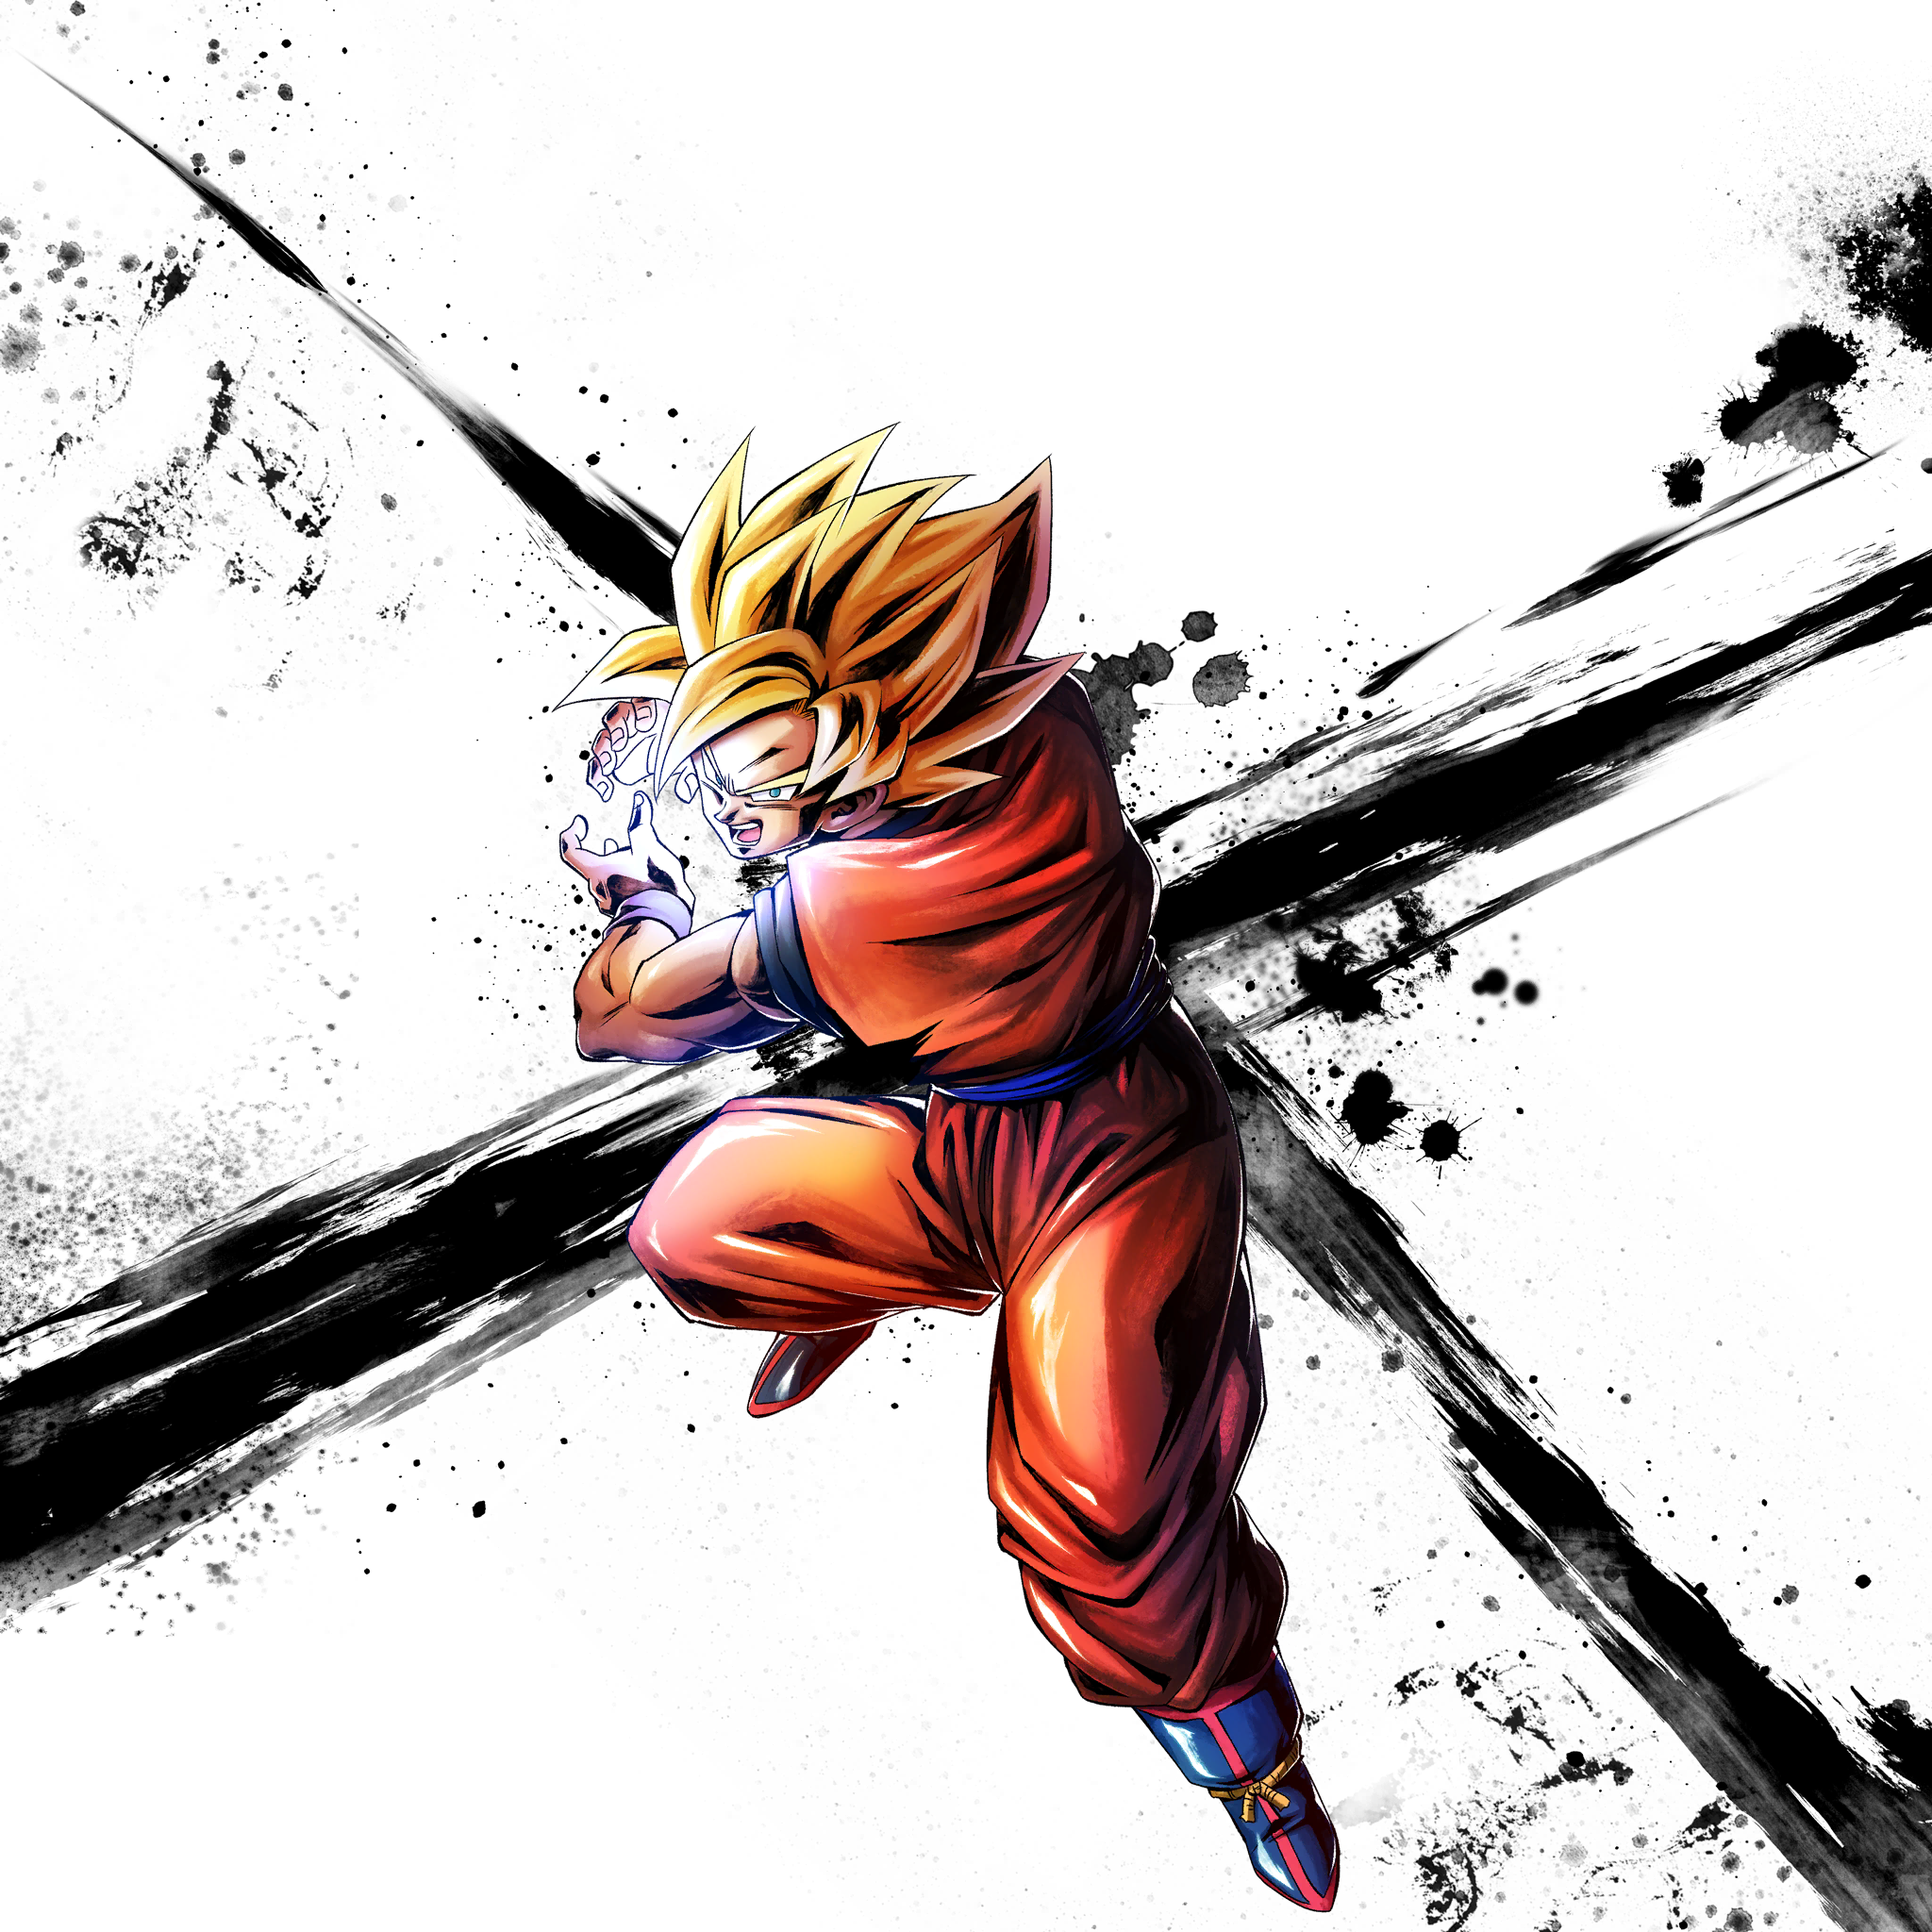 Goku Ssj Kamehameha Render 9 Dragon Ball Legends By Maxiuchiha22 On Deviantart Personajes De Dragon Ball Dibujos Bonitos De Animales Dibujo De Goku